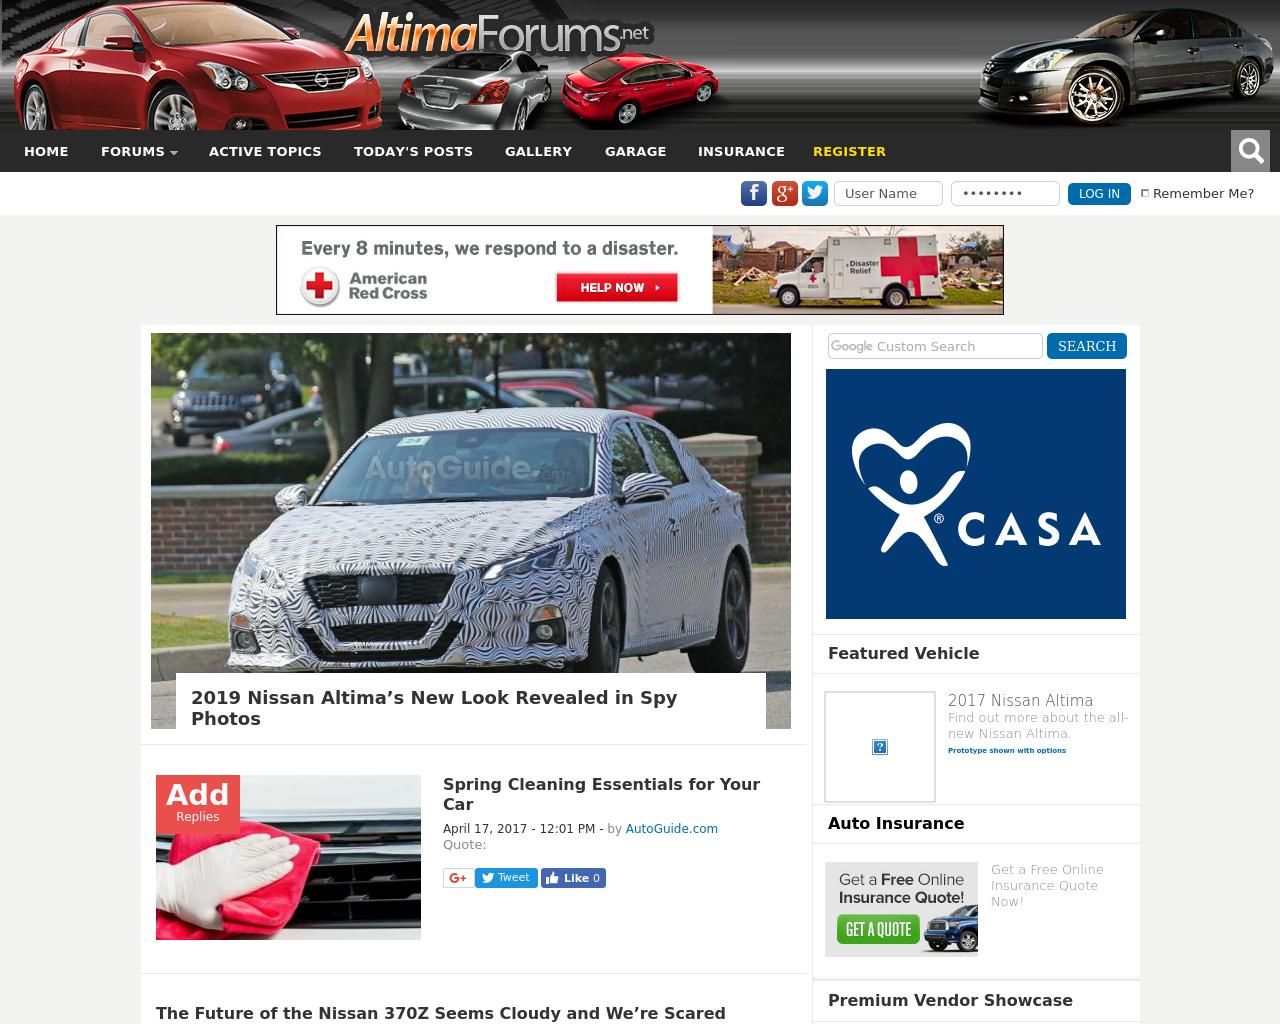 Nissan-Altima-Forum-Advertising-Reviews-Pricing